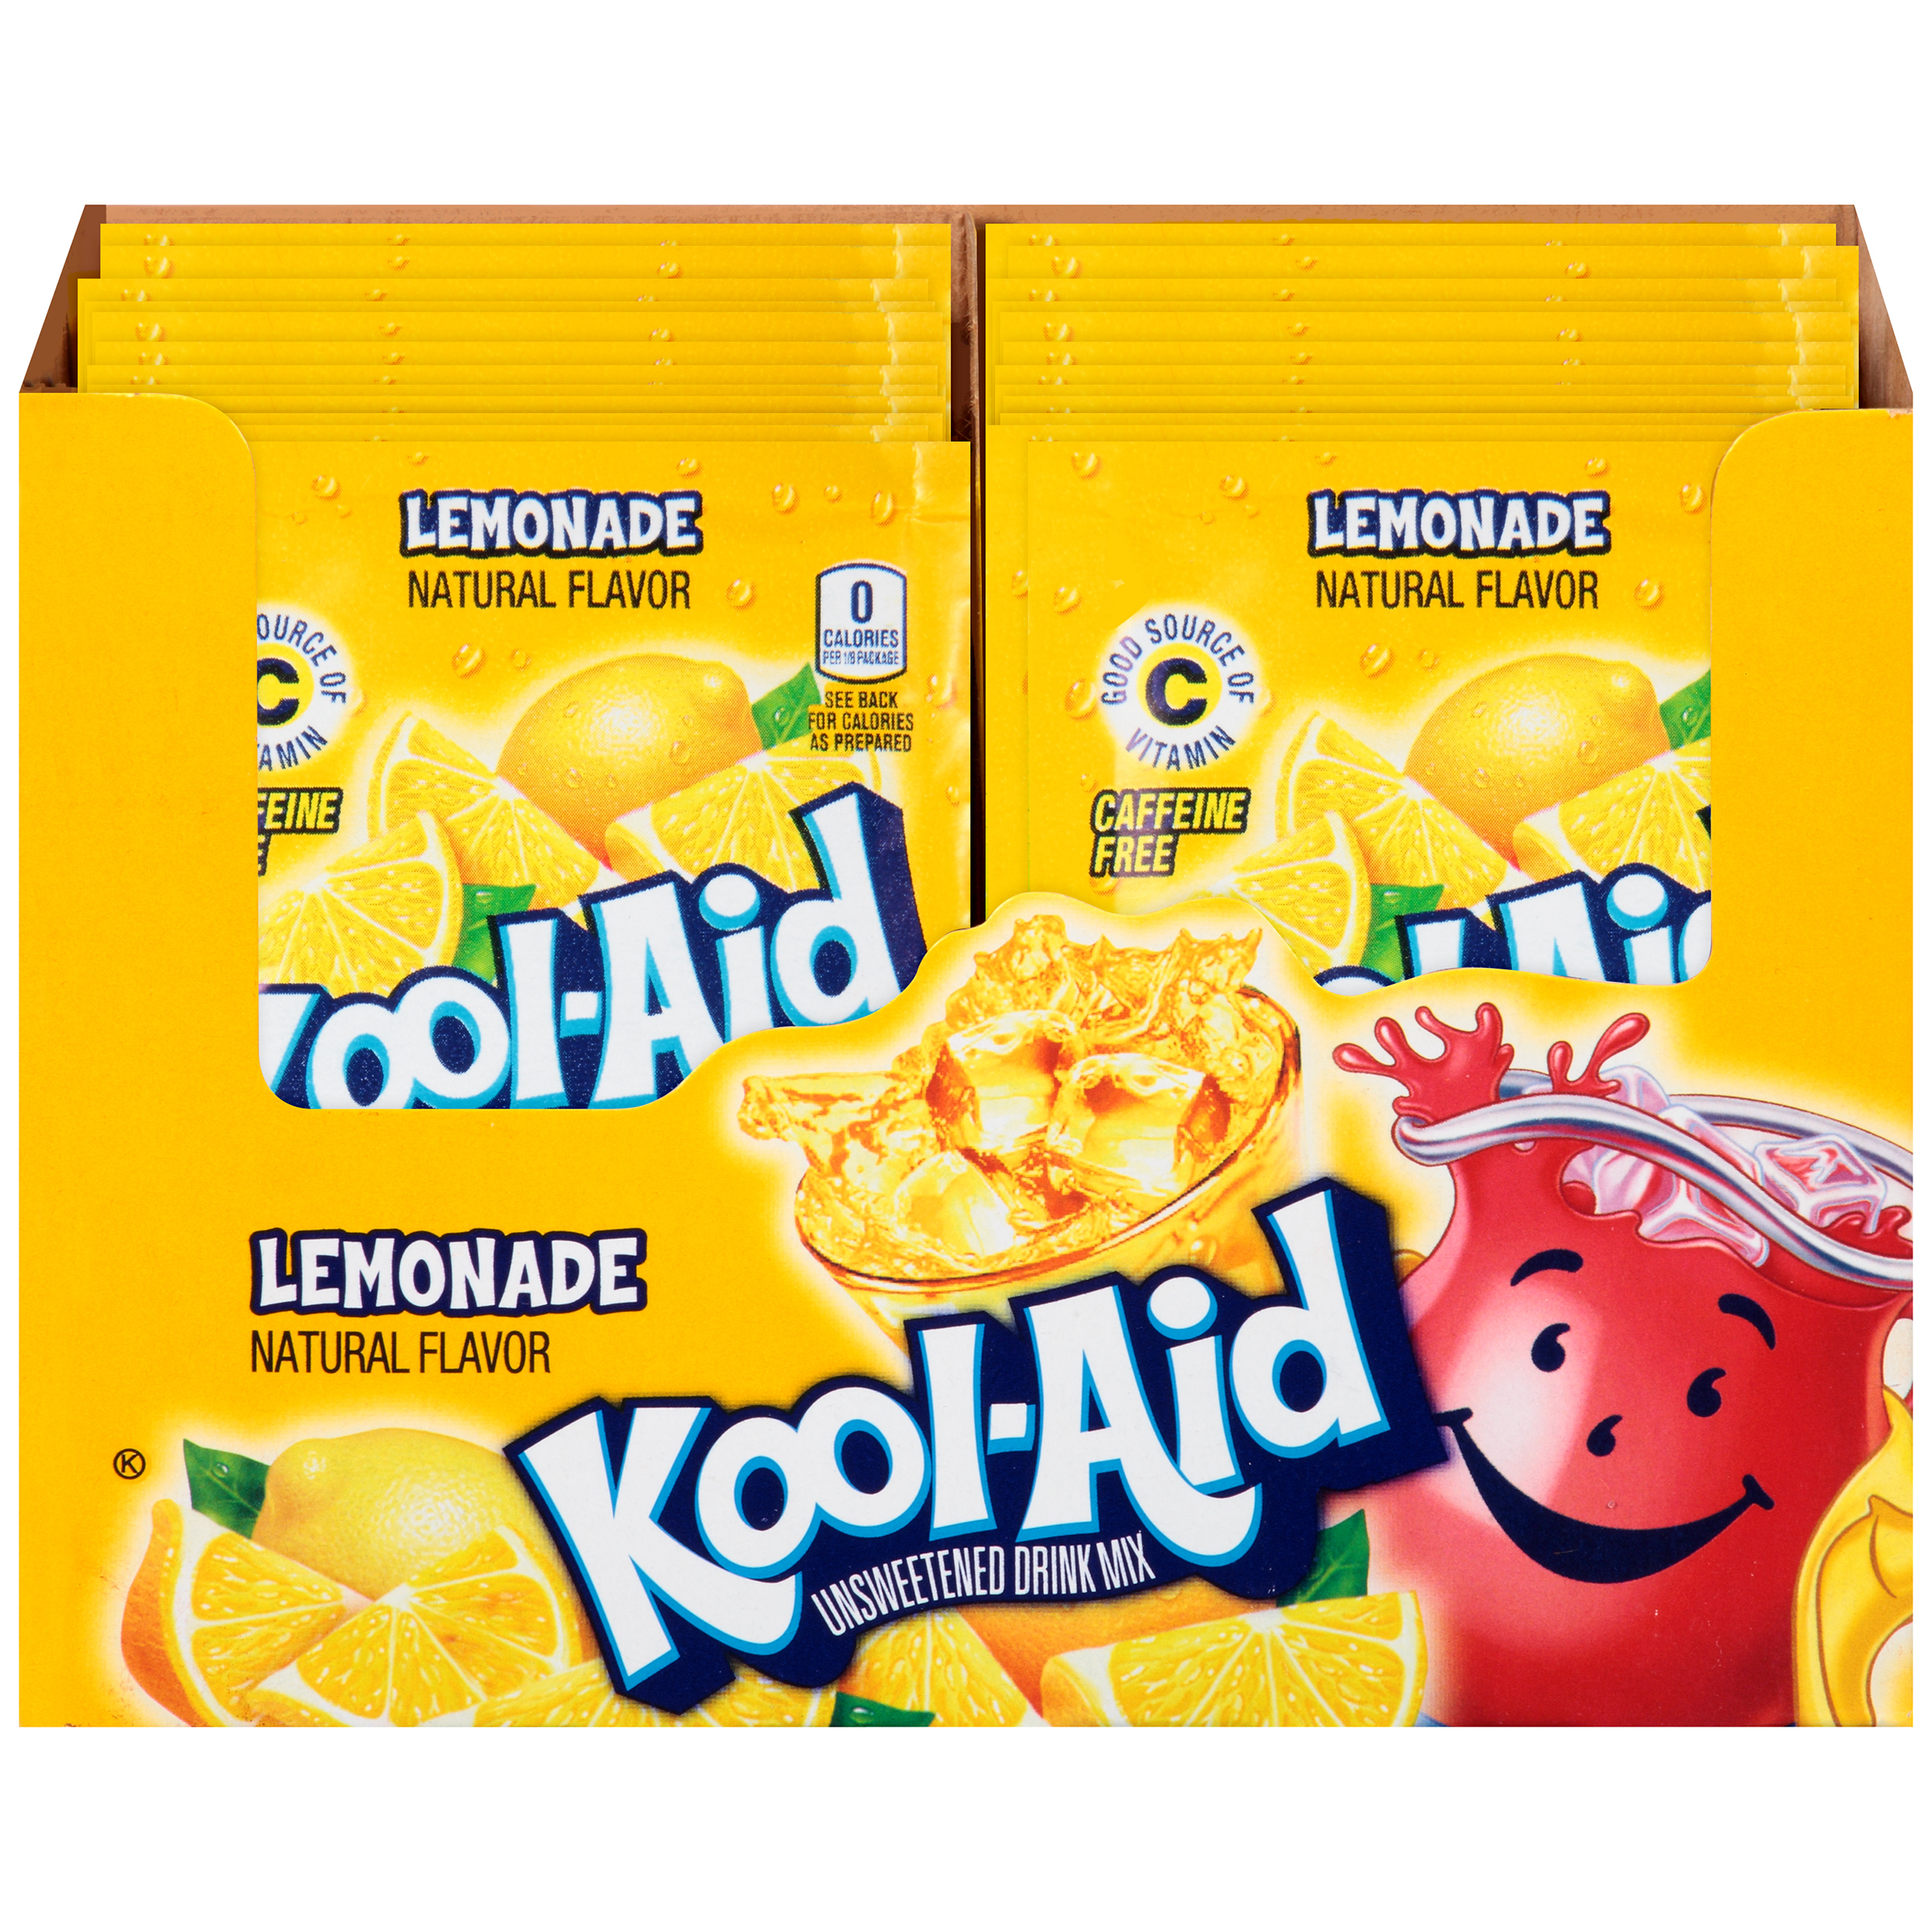 KOOL-AID Lemonade Drink Mix Unsweetened 0.23 oz Packet image